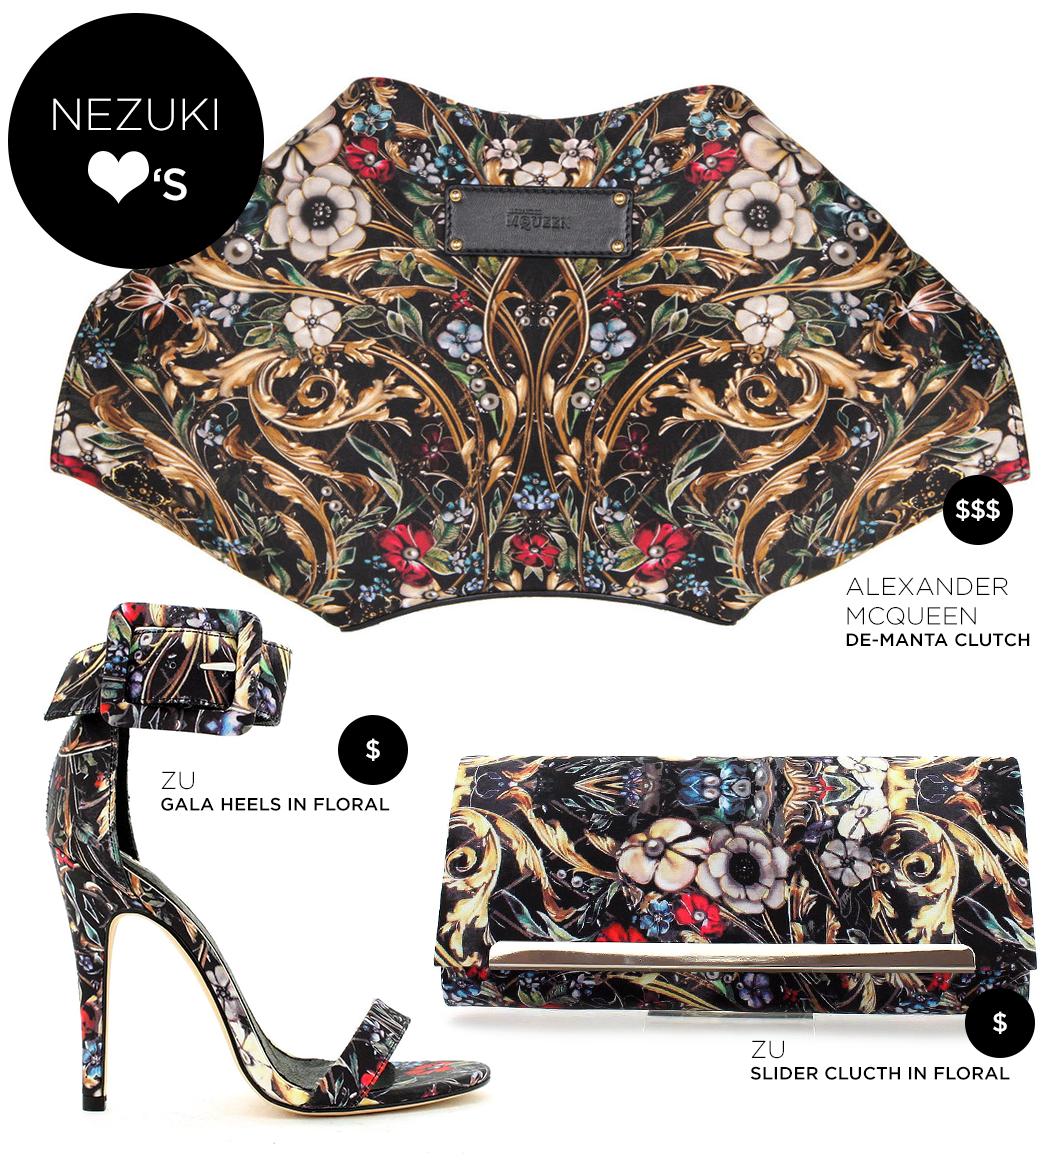 Nezuki, Alexander McQueen, ZU shoes